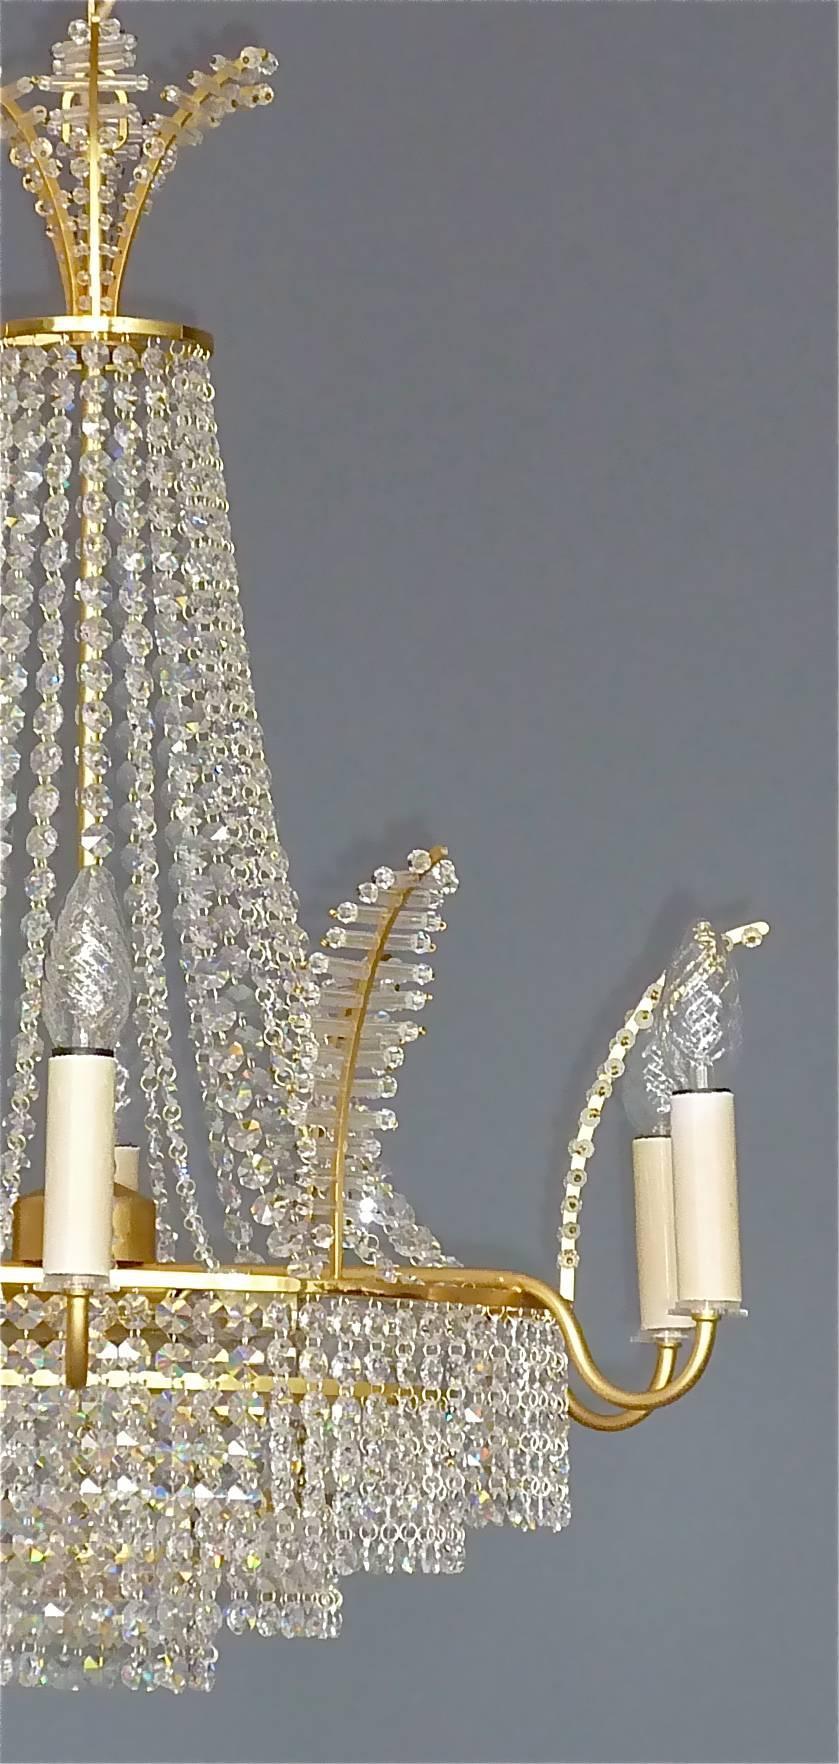 Advertising Ceiling Light Lamp Fixture Light Fitting C1870 Photogravure High Resilience